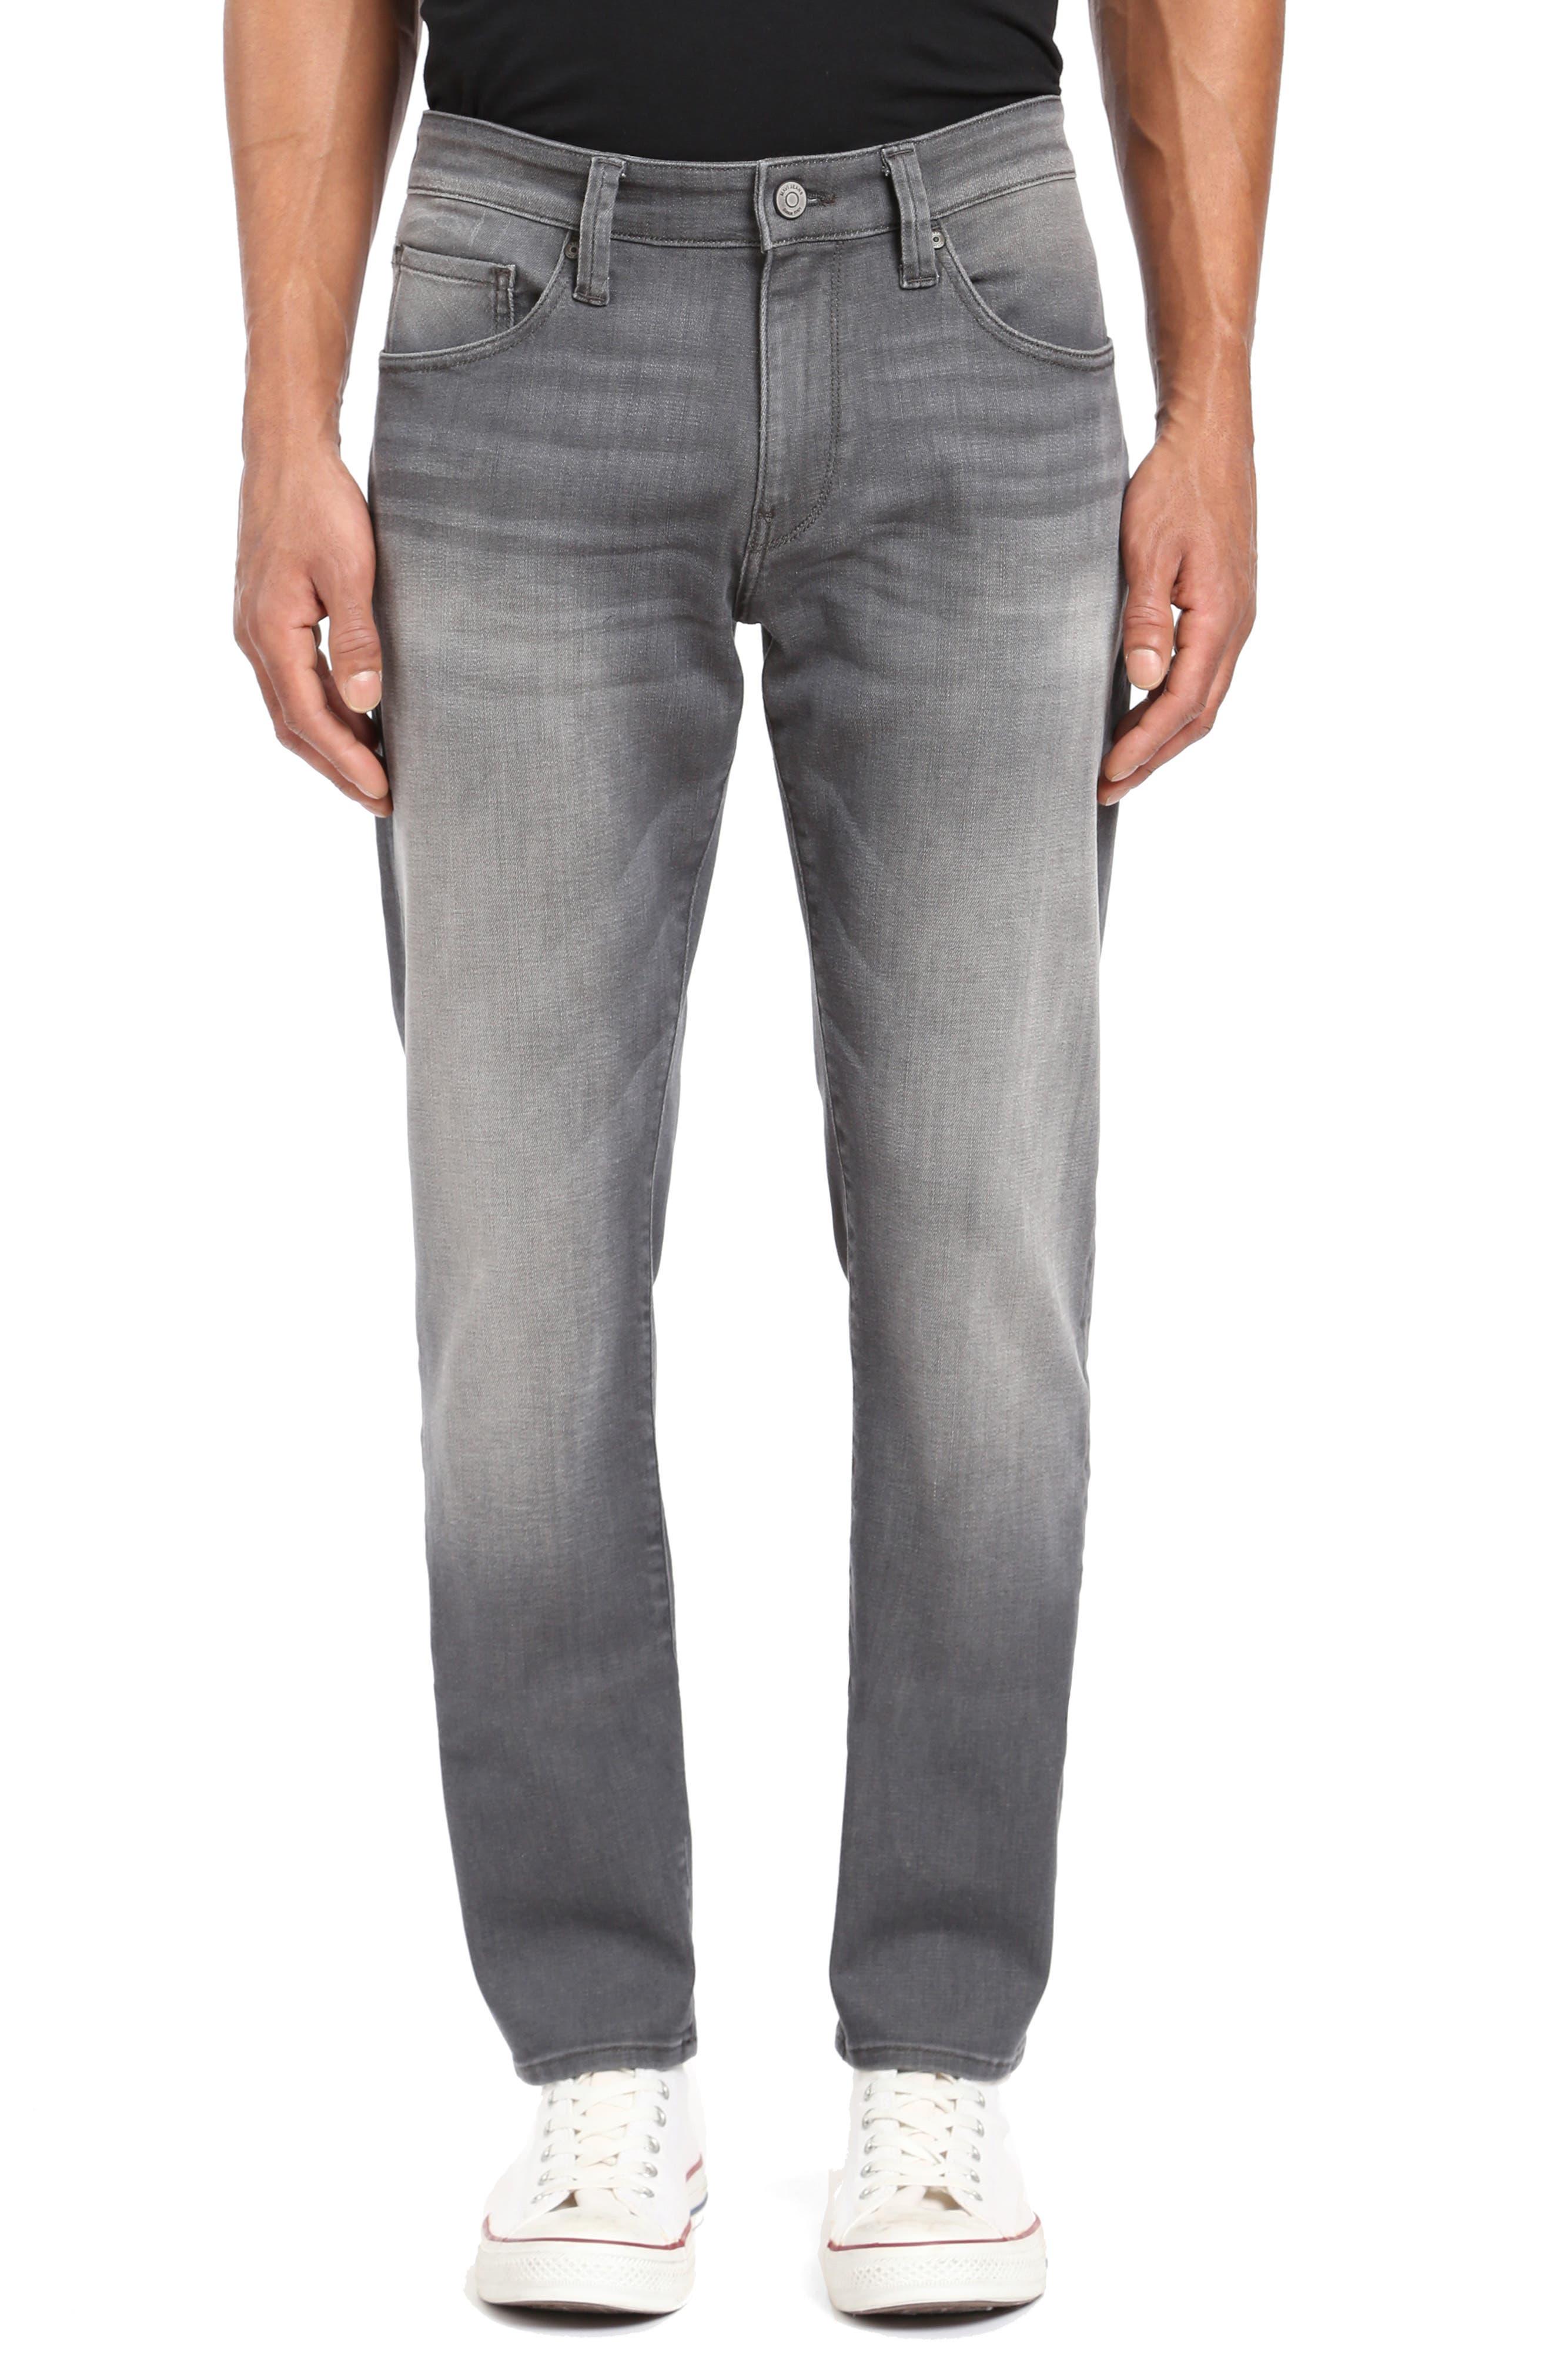 Zach Straight Leg Jeans,                         Main,                         color, LIGHT GREY BROOKLYN